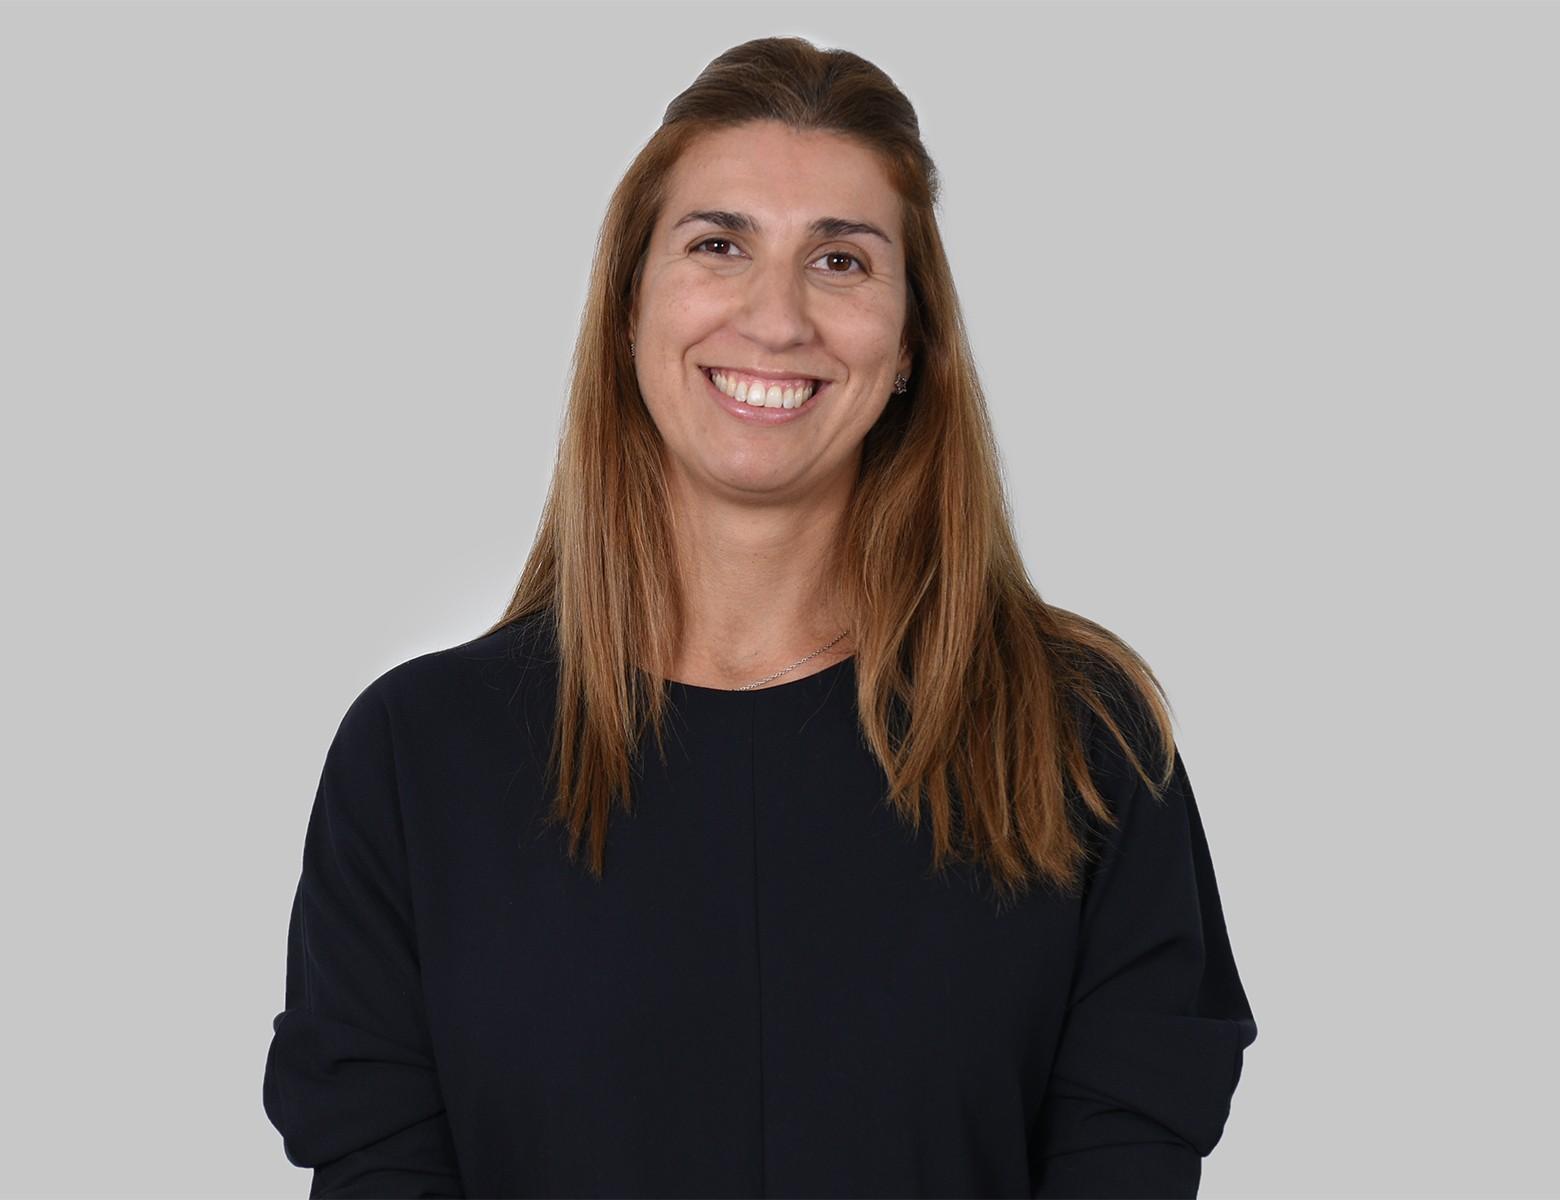 Maria Joao Beires